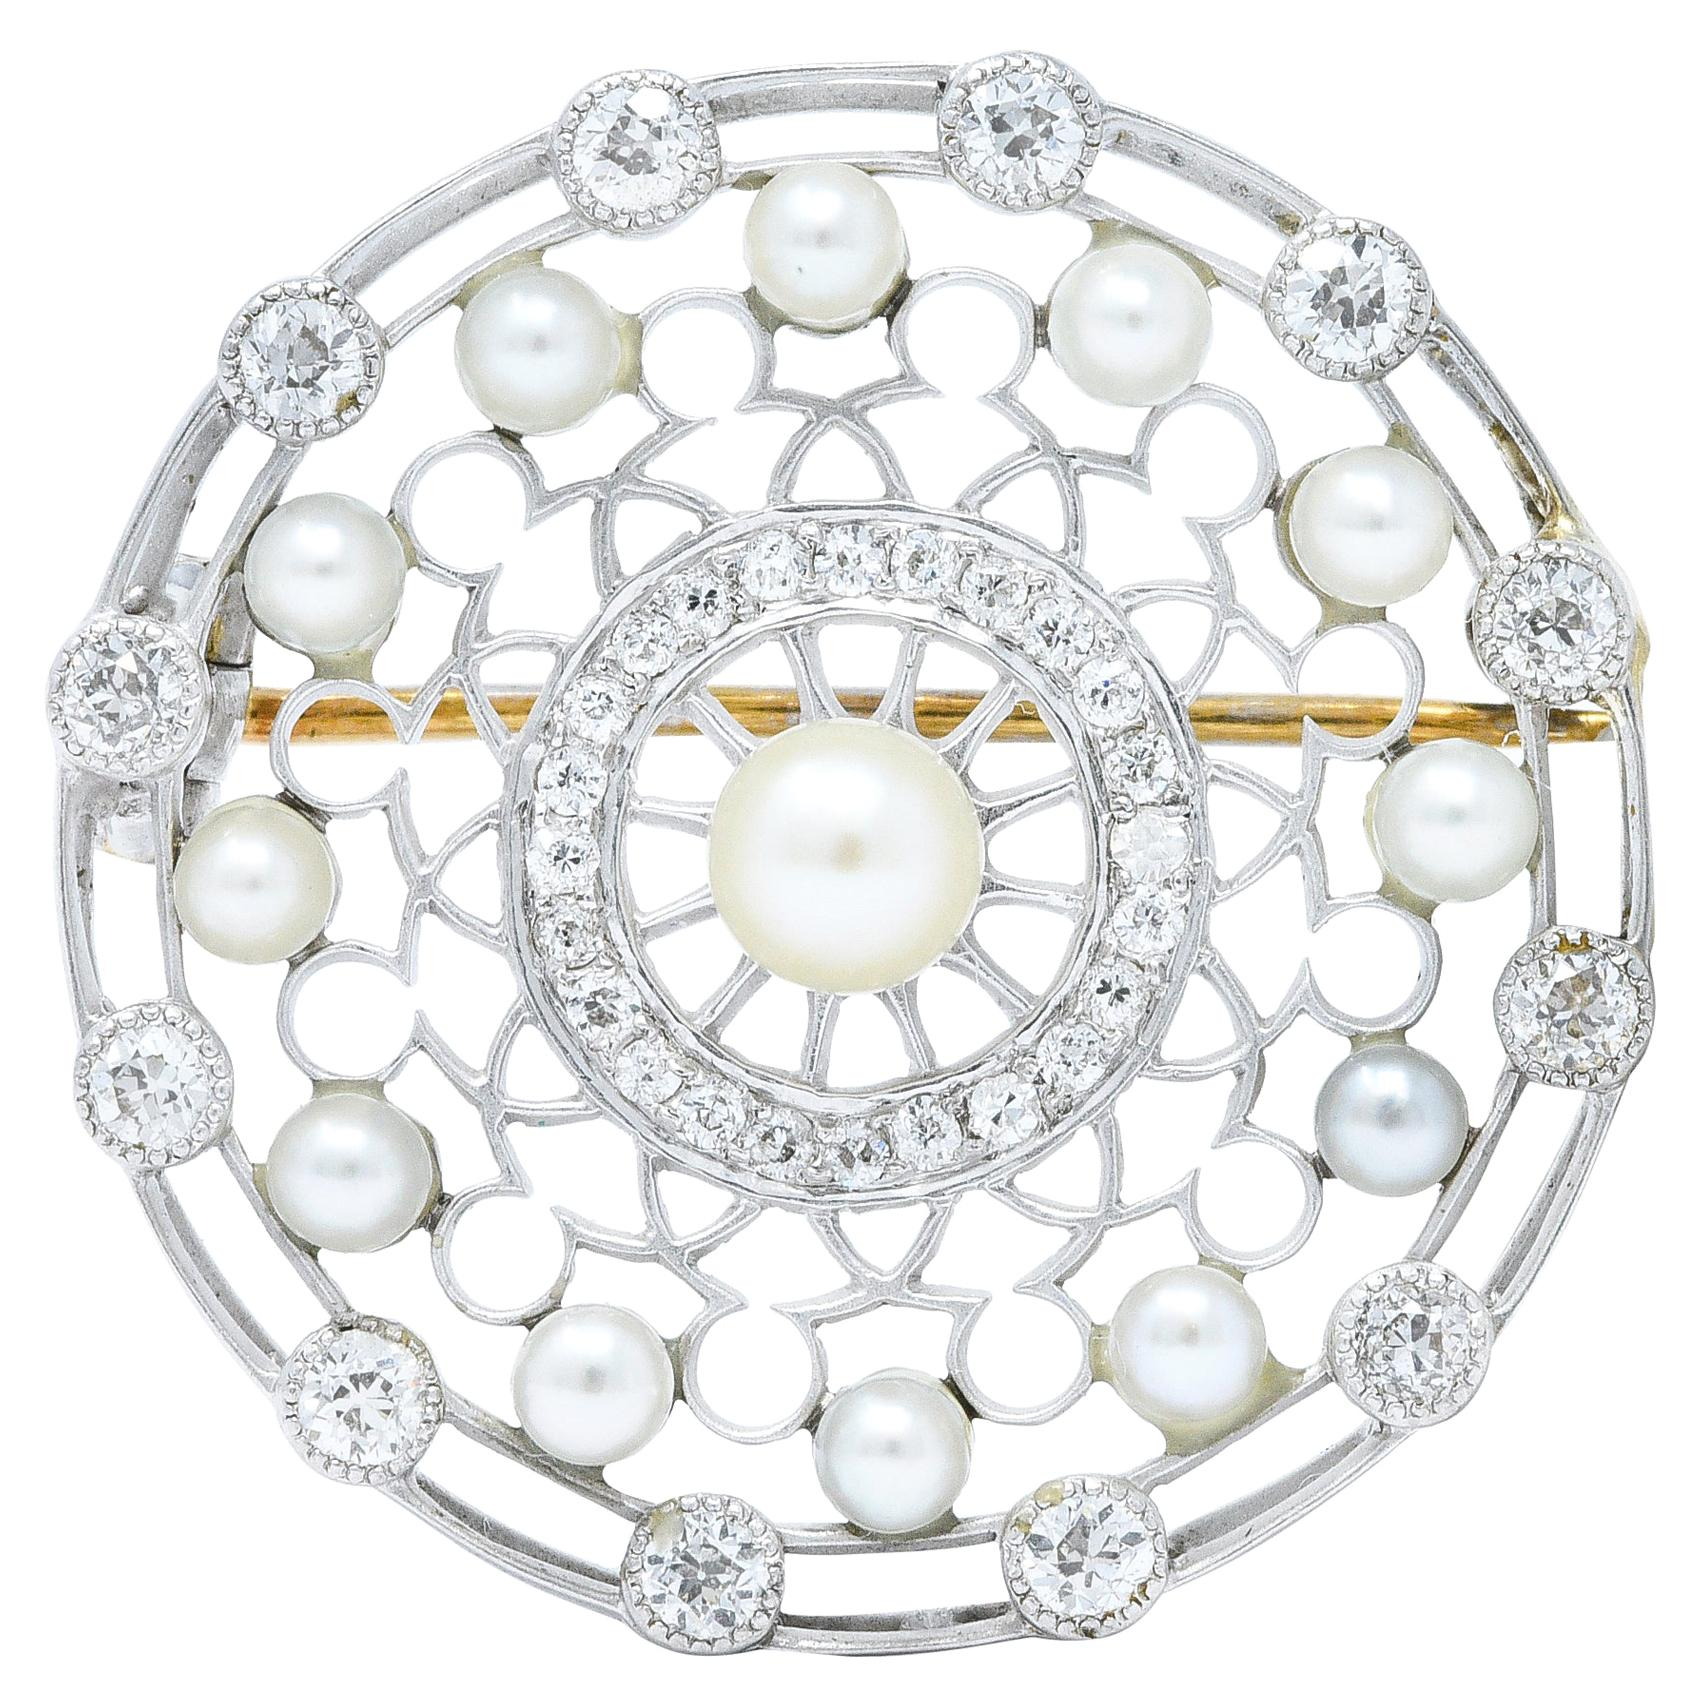 Tiffany & Co. Edwardian Pearl Diamond Platinum Brooch